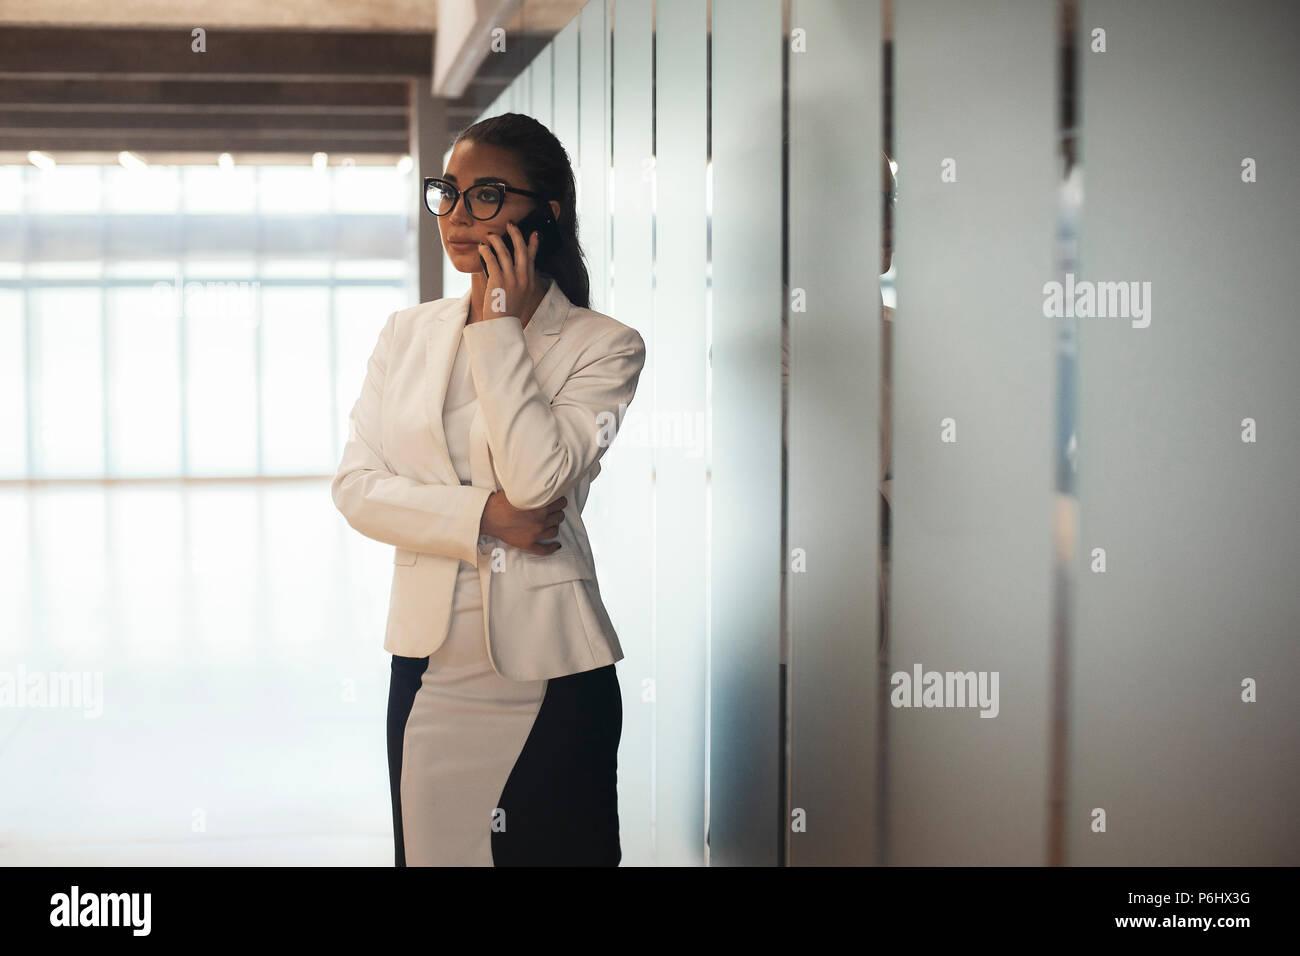 Junge brunette Business brillenbär Frau Gespräch per Handy. Stockbild